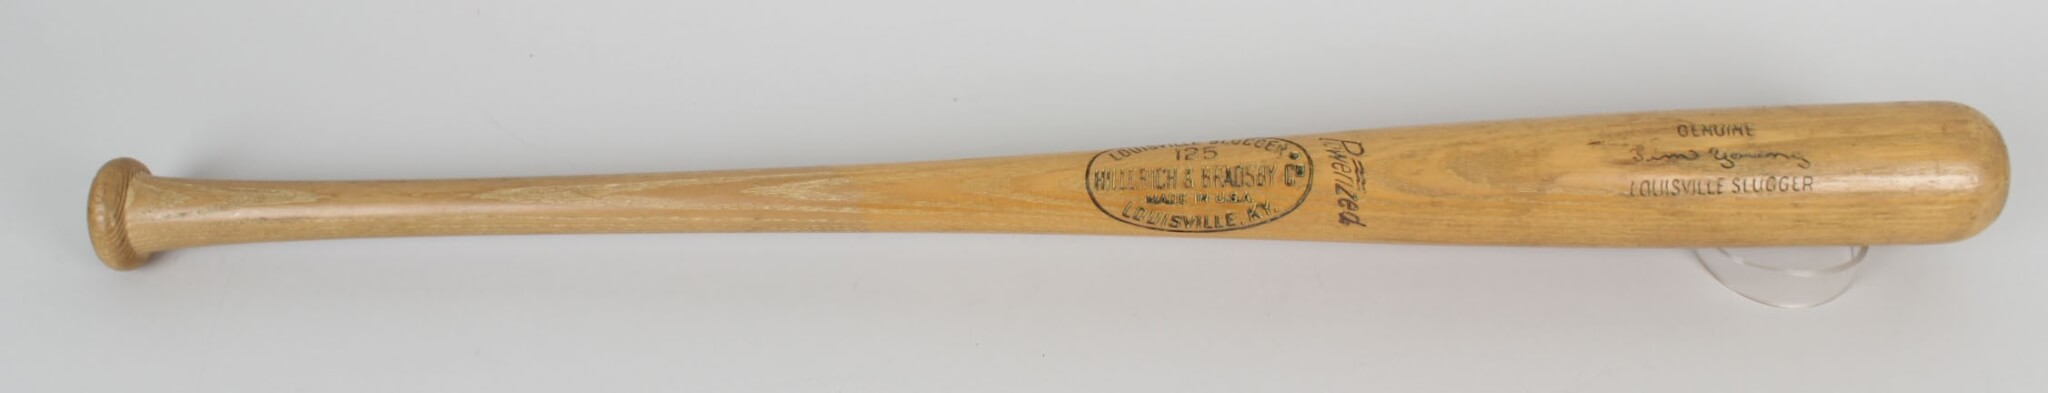 1998 Expos Tim Young Game-Used Louisville Slugger K55 Bat41818_01